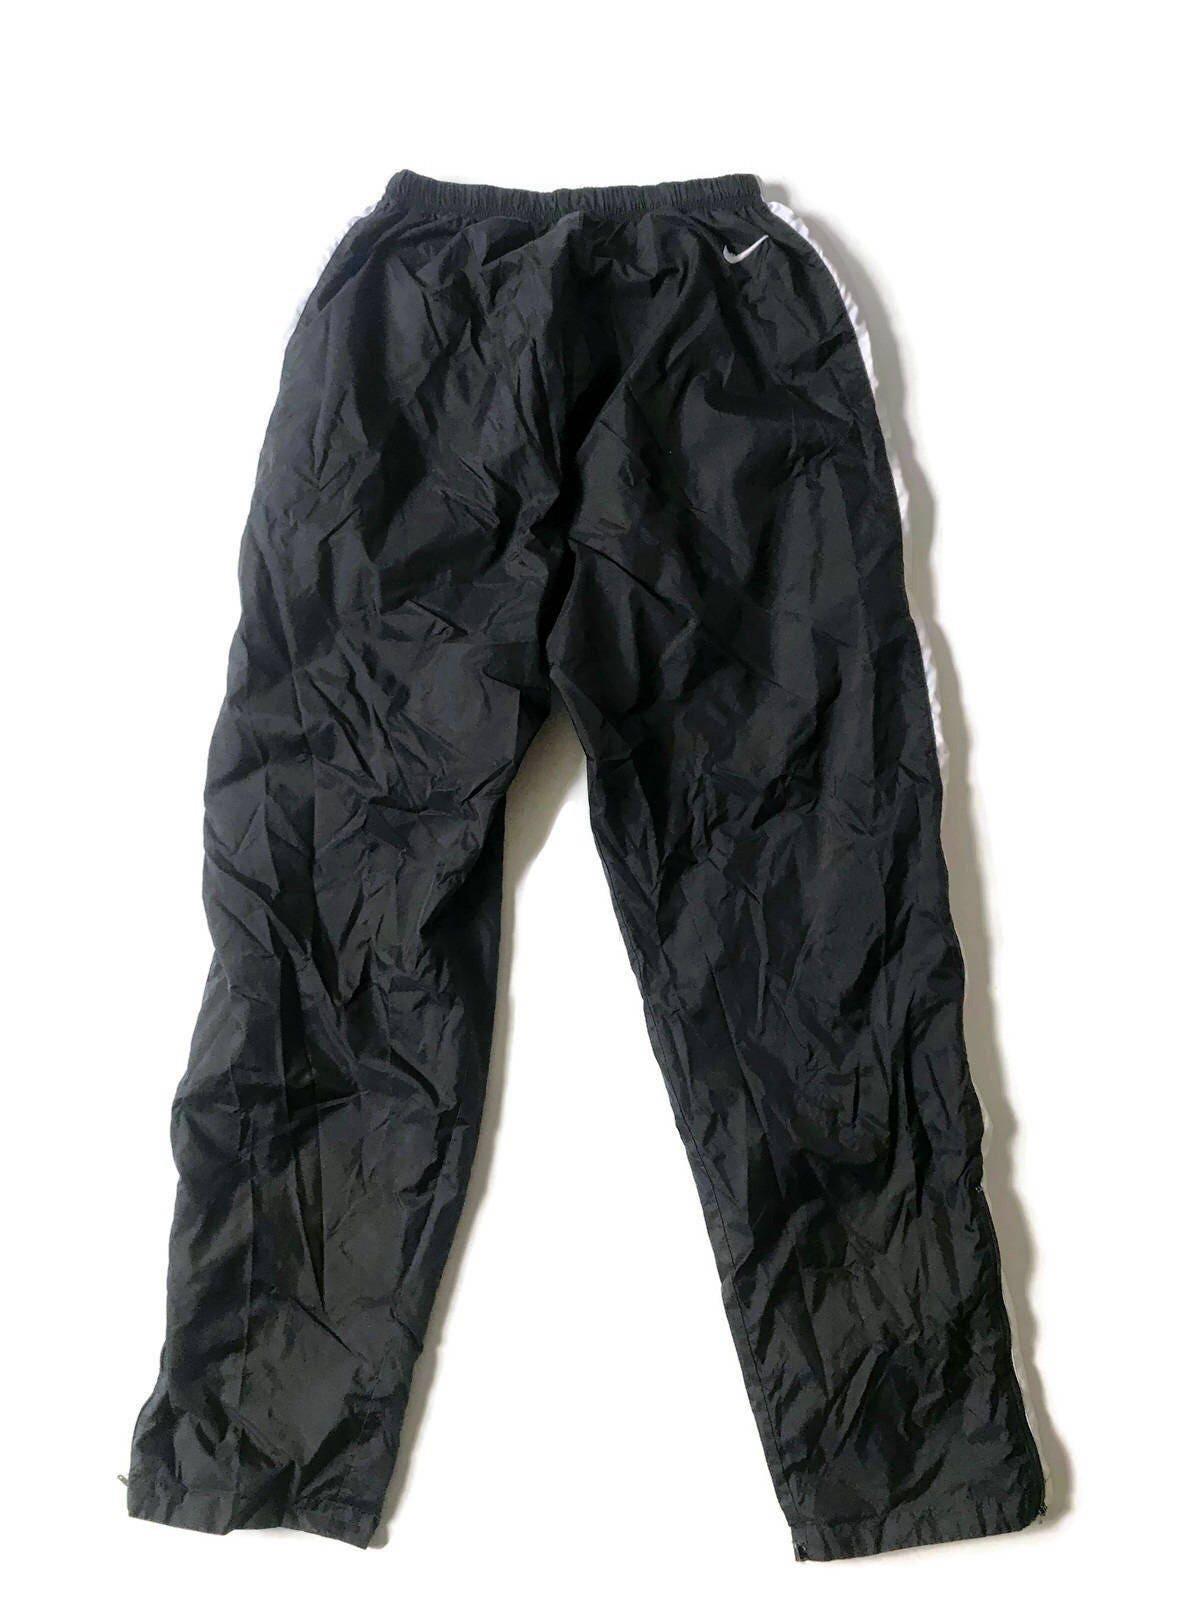 f088fe00124e3 Vintage Nike Reversible Sweatpants Windbreaker Pants Nylon Track Running  Womens M